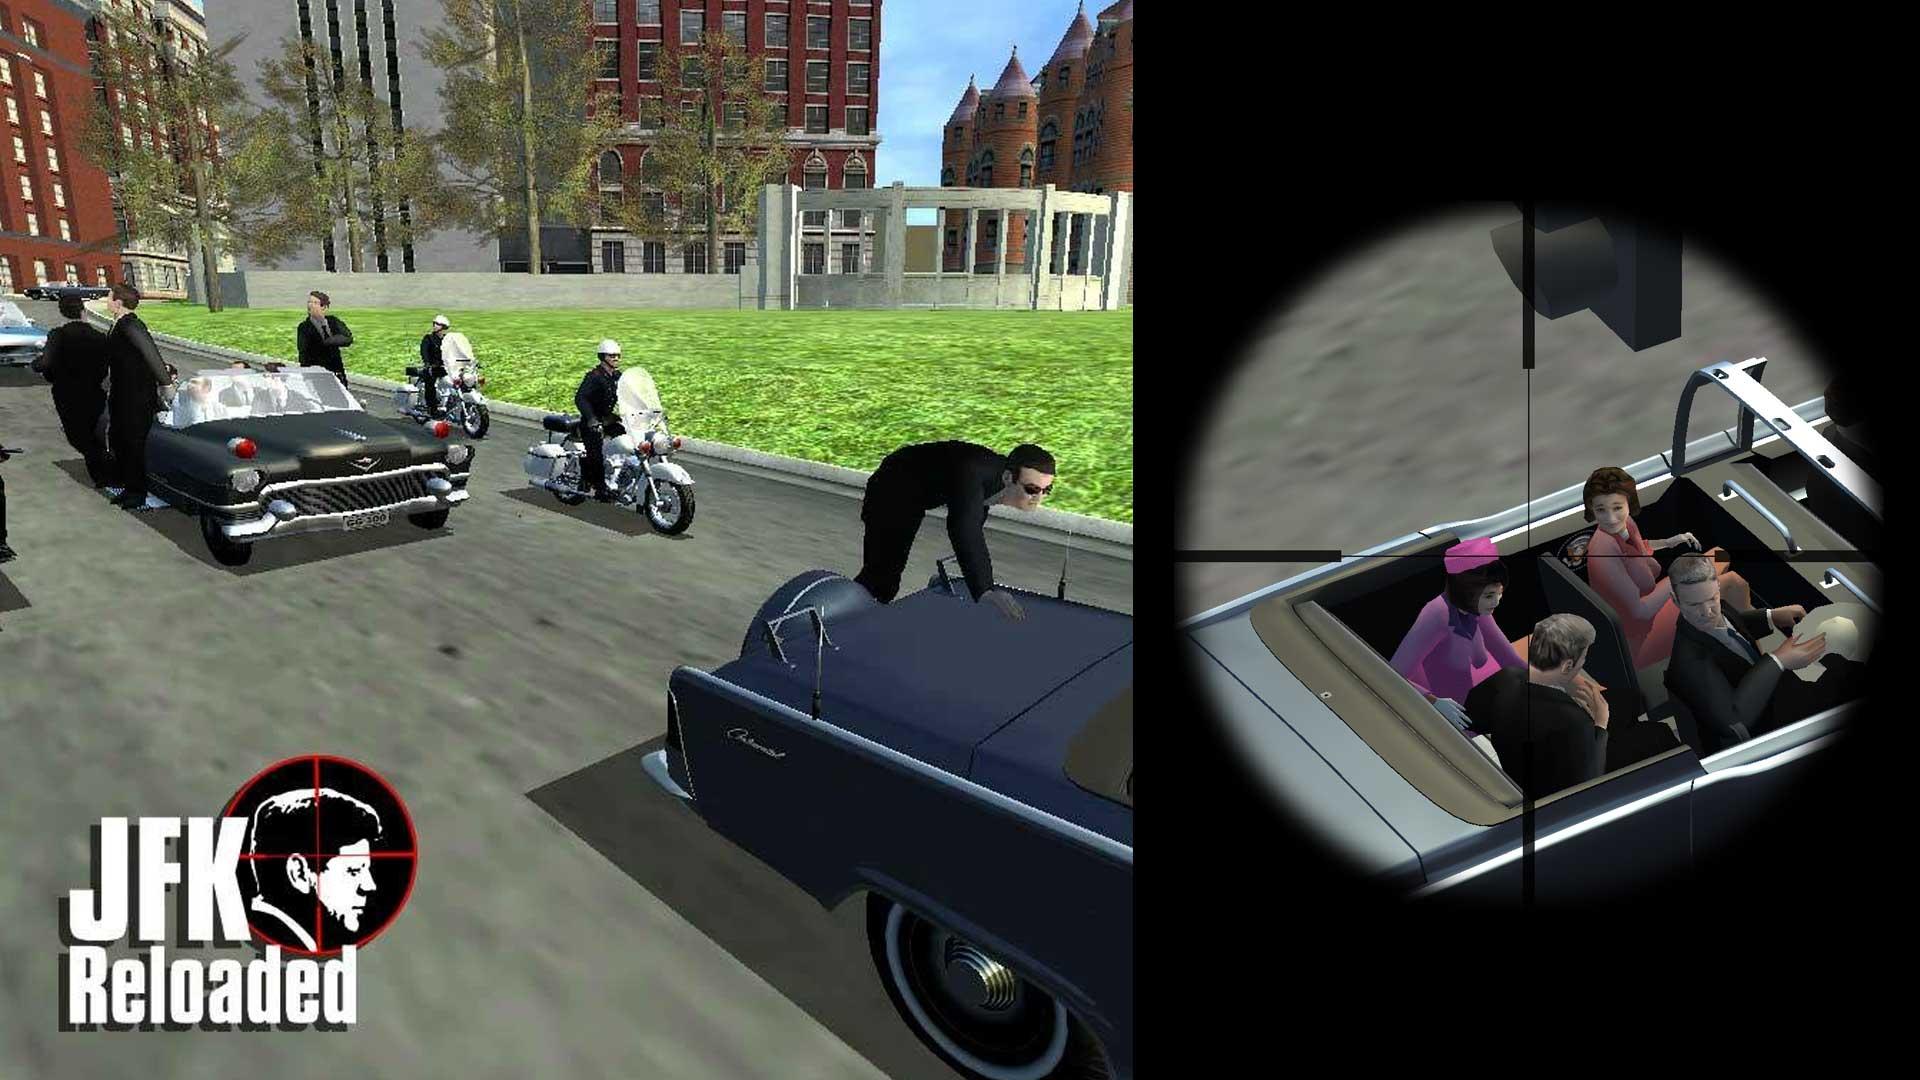 Jfk: reloaded a simulation of the jfk assassination youtube.